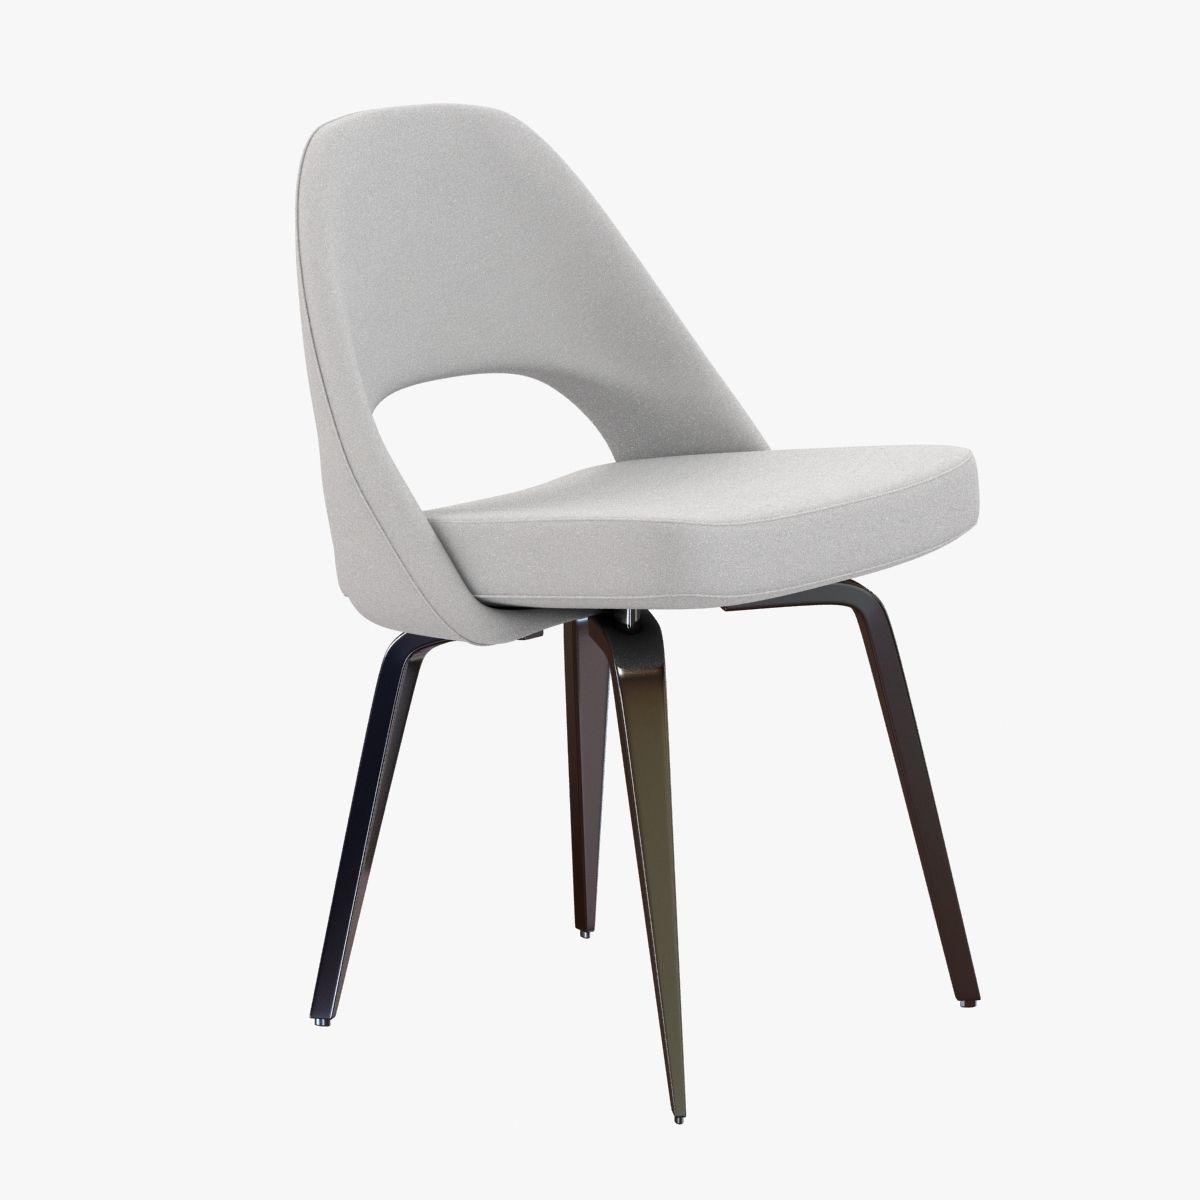 Chair saarinen executive chair - Saarinen Executive Side Chair 3d Model Max Obj 3ds Fbx Mtl 1